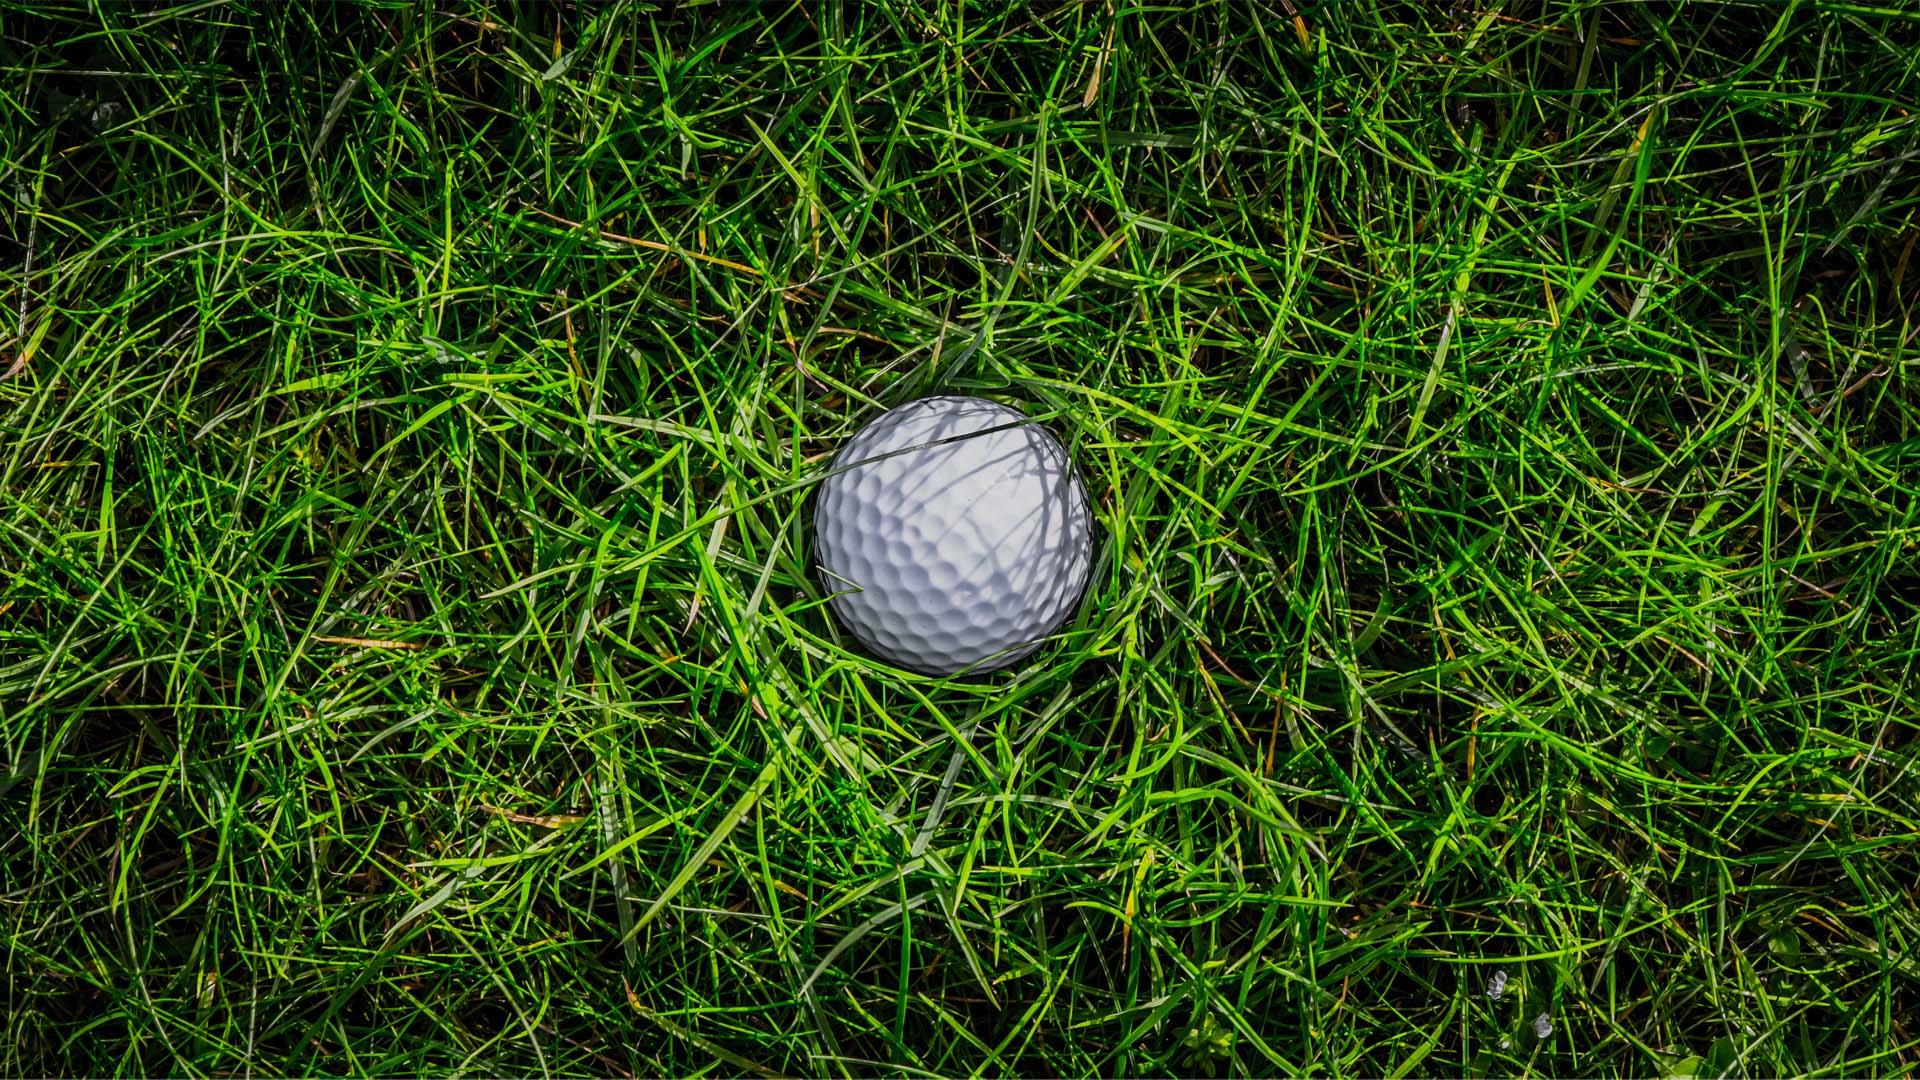 PERform Golf - golfanalyse, blessurepreventie, educatie